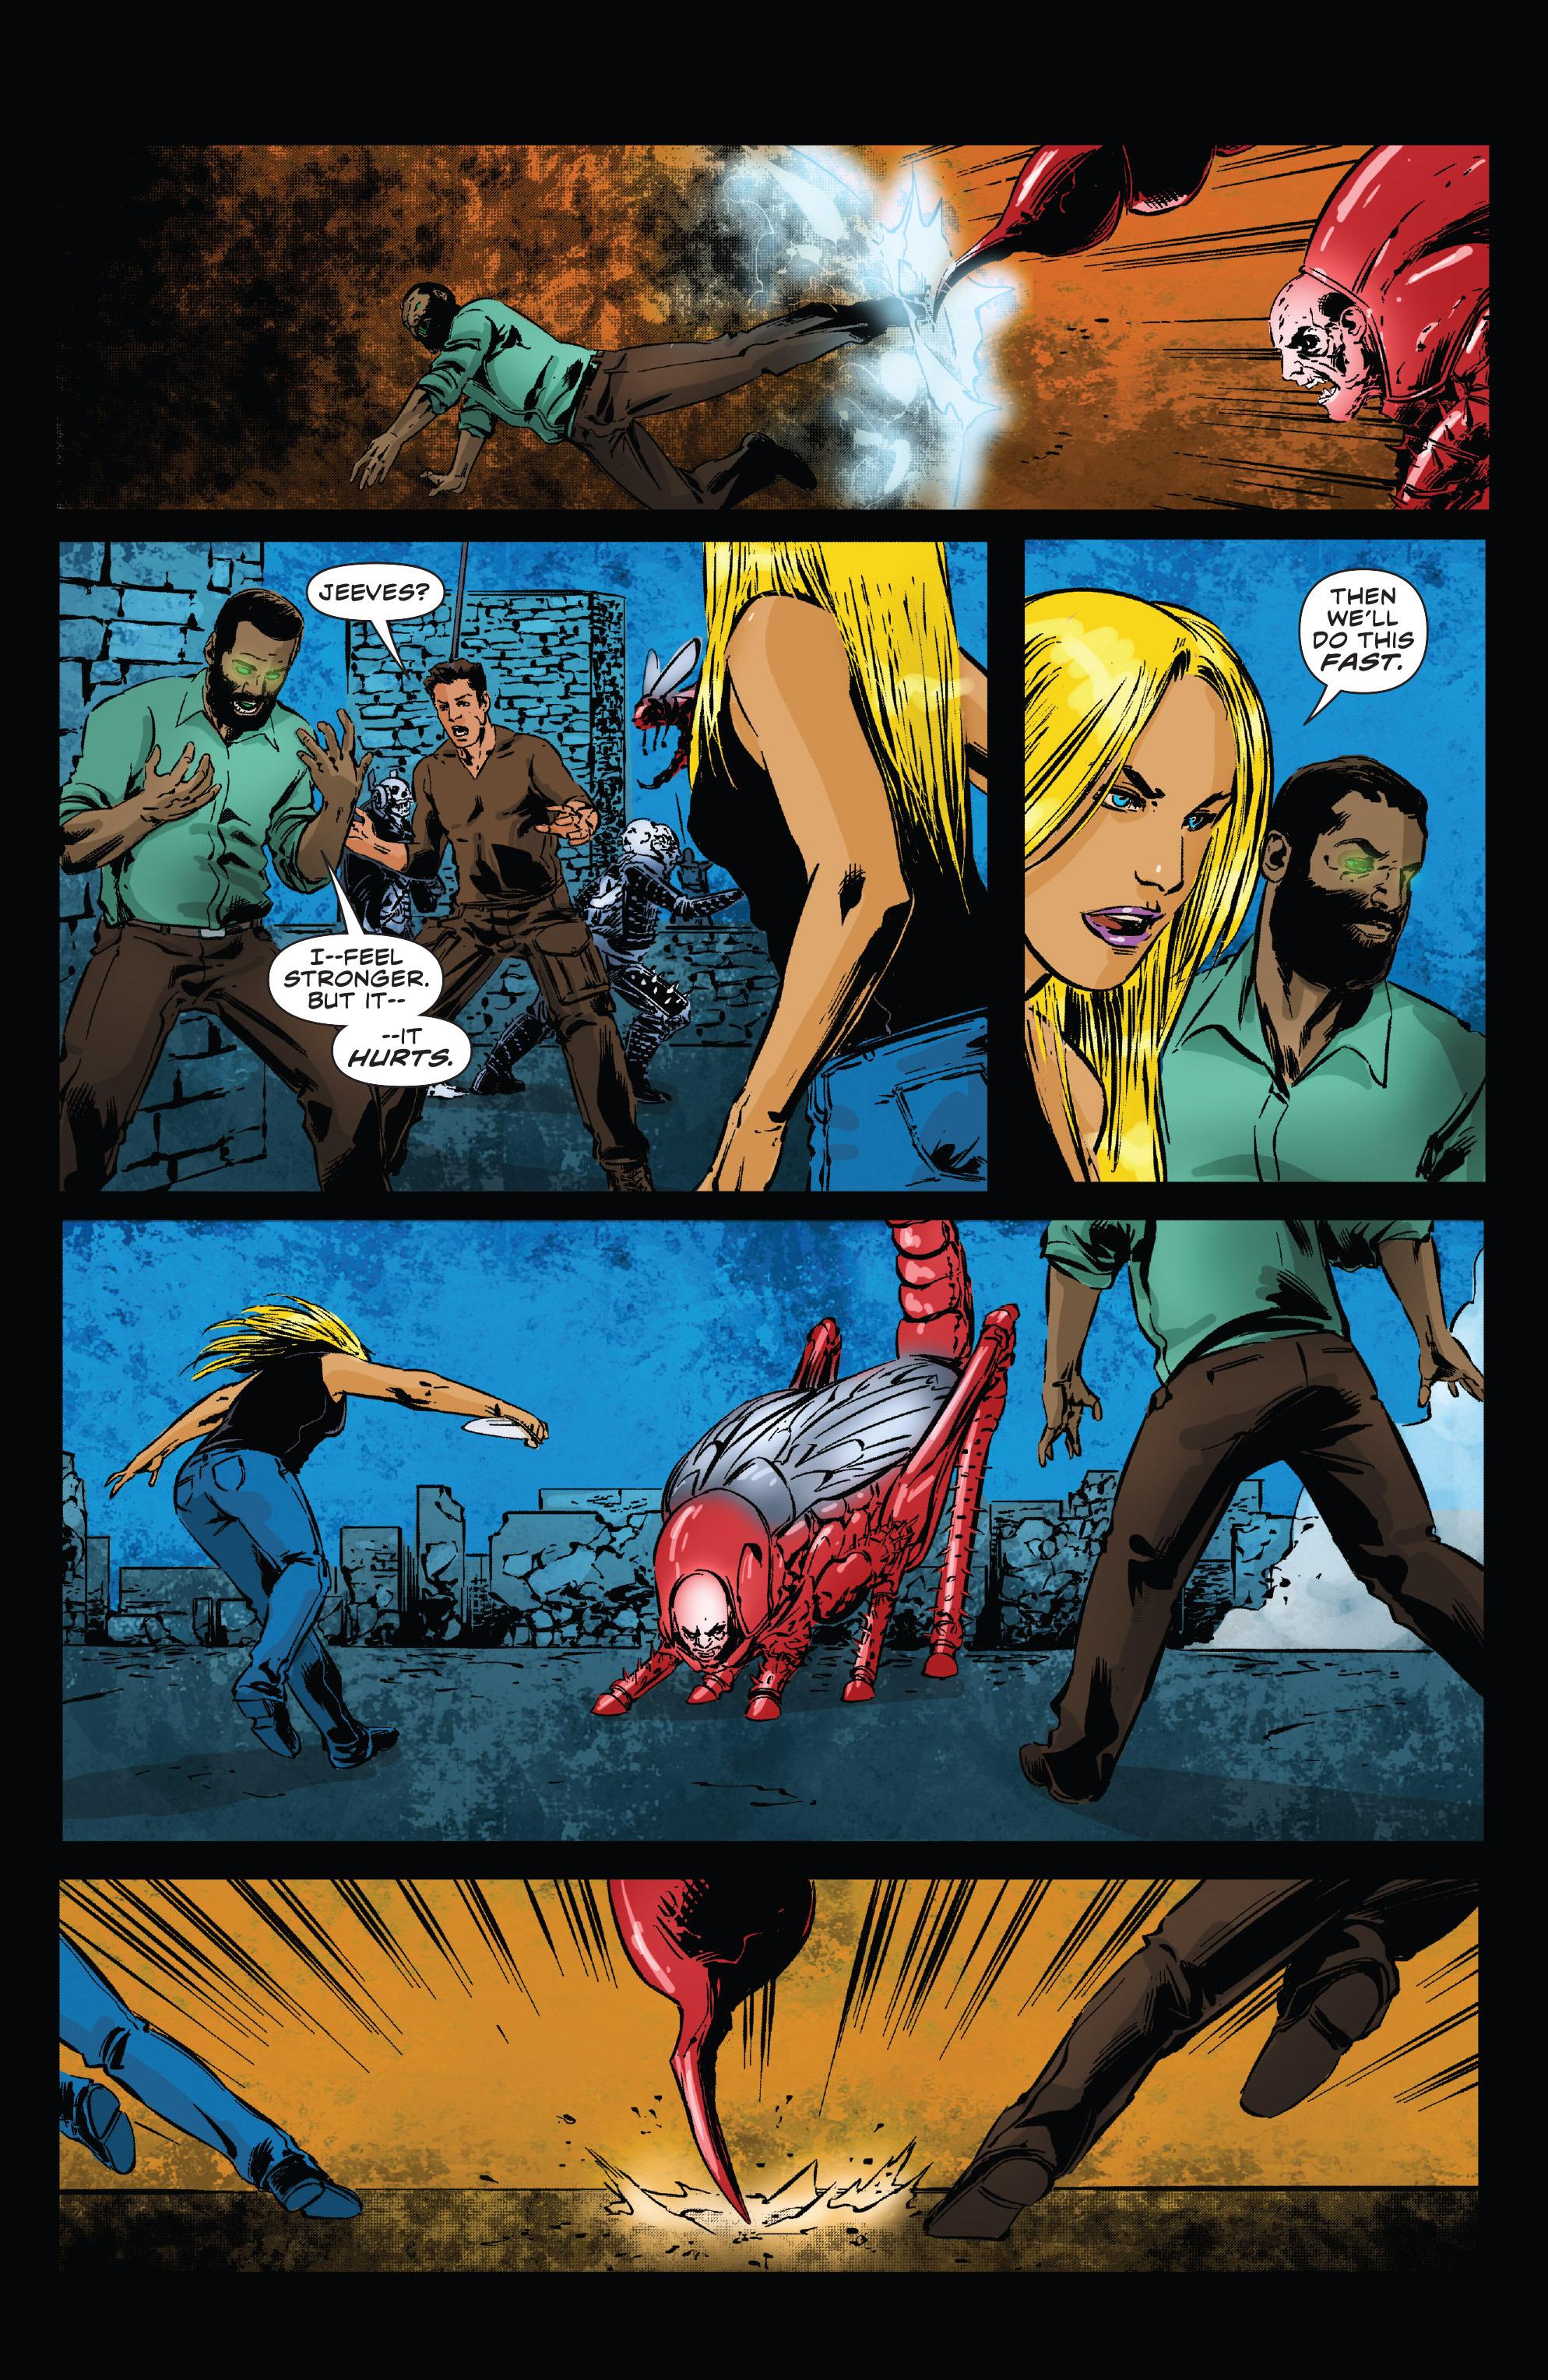 Read online Clive Barker's Hellraiser: The Dark Watch comic -  Issue # TPB 3 - 52